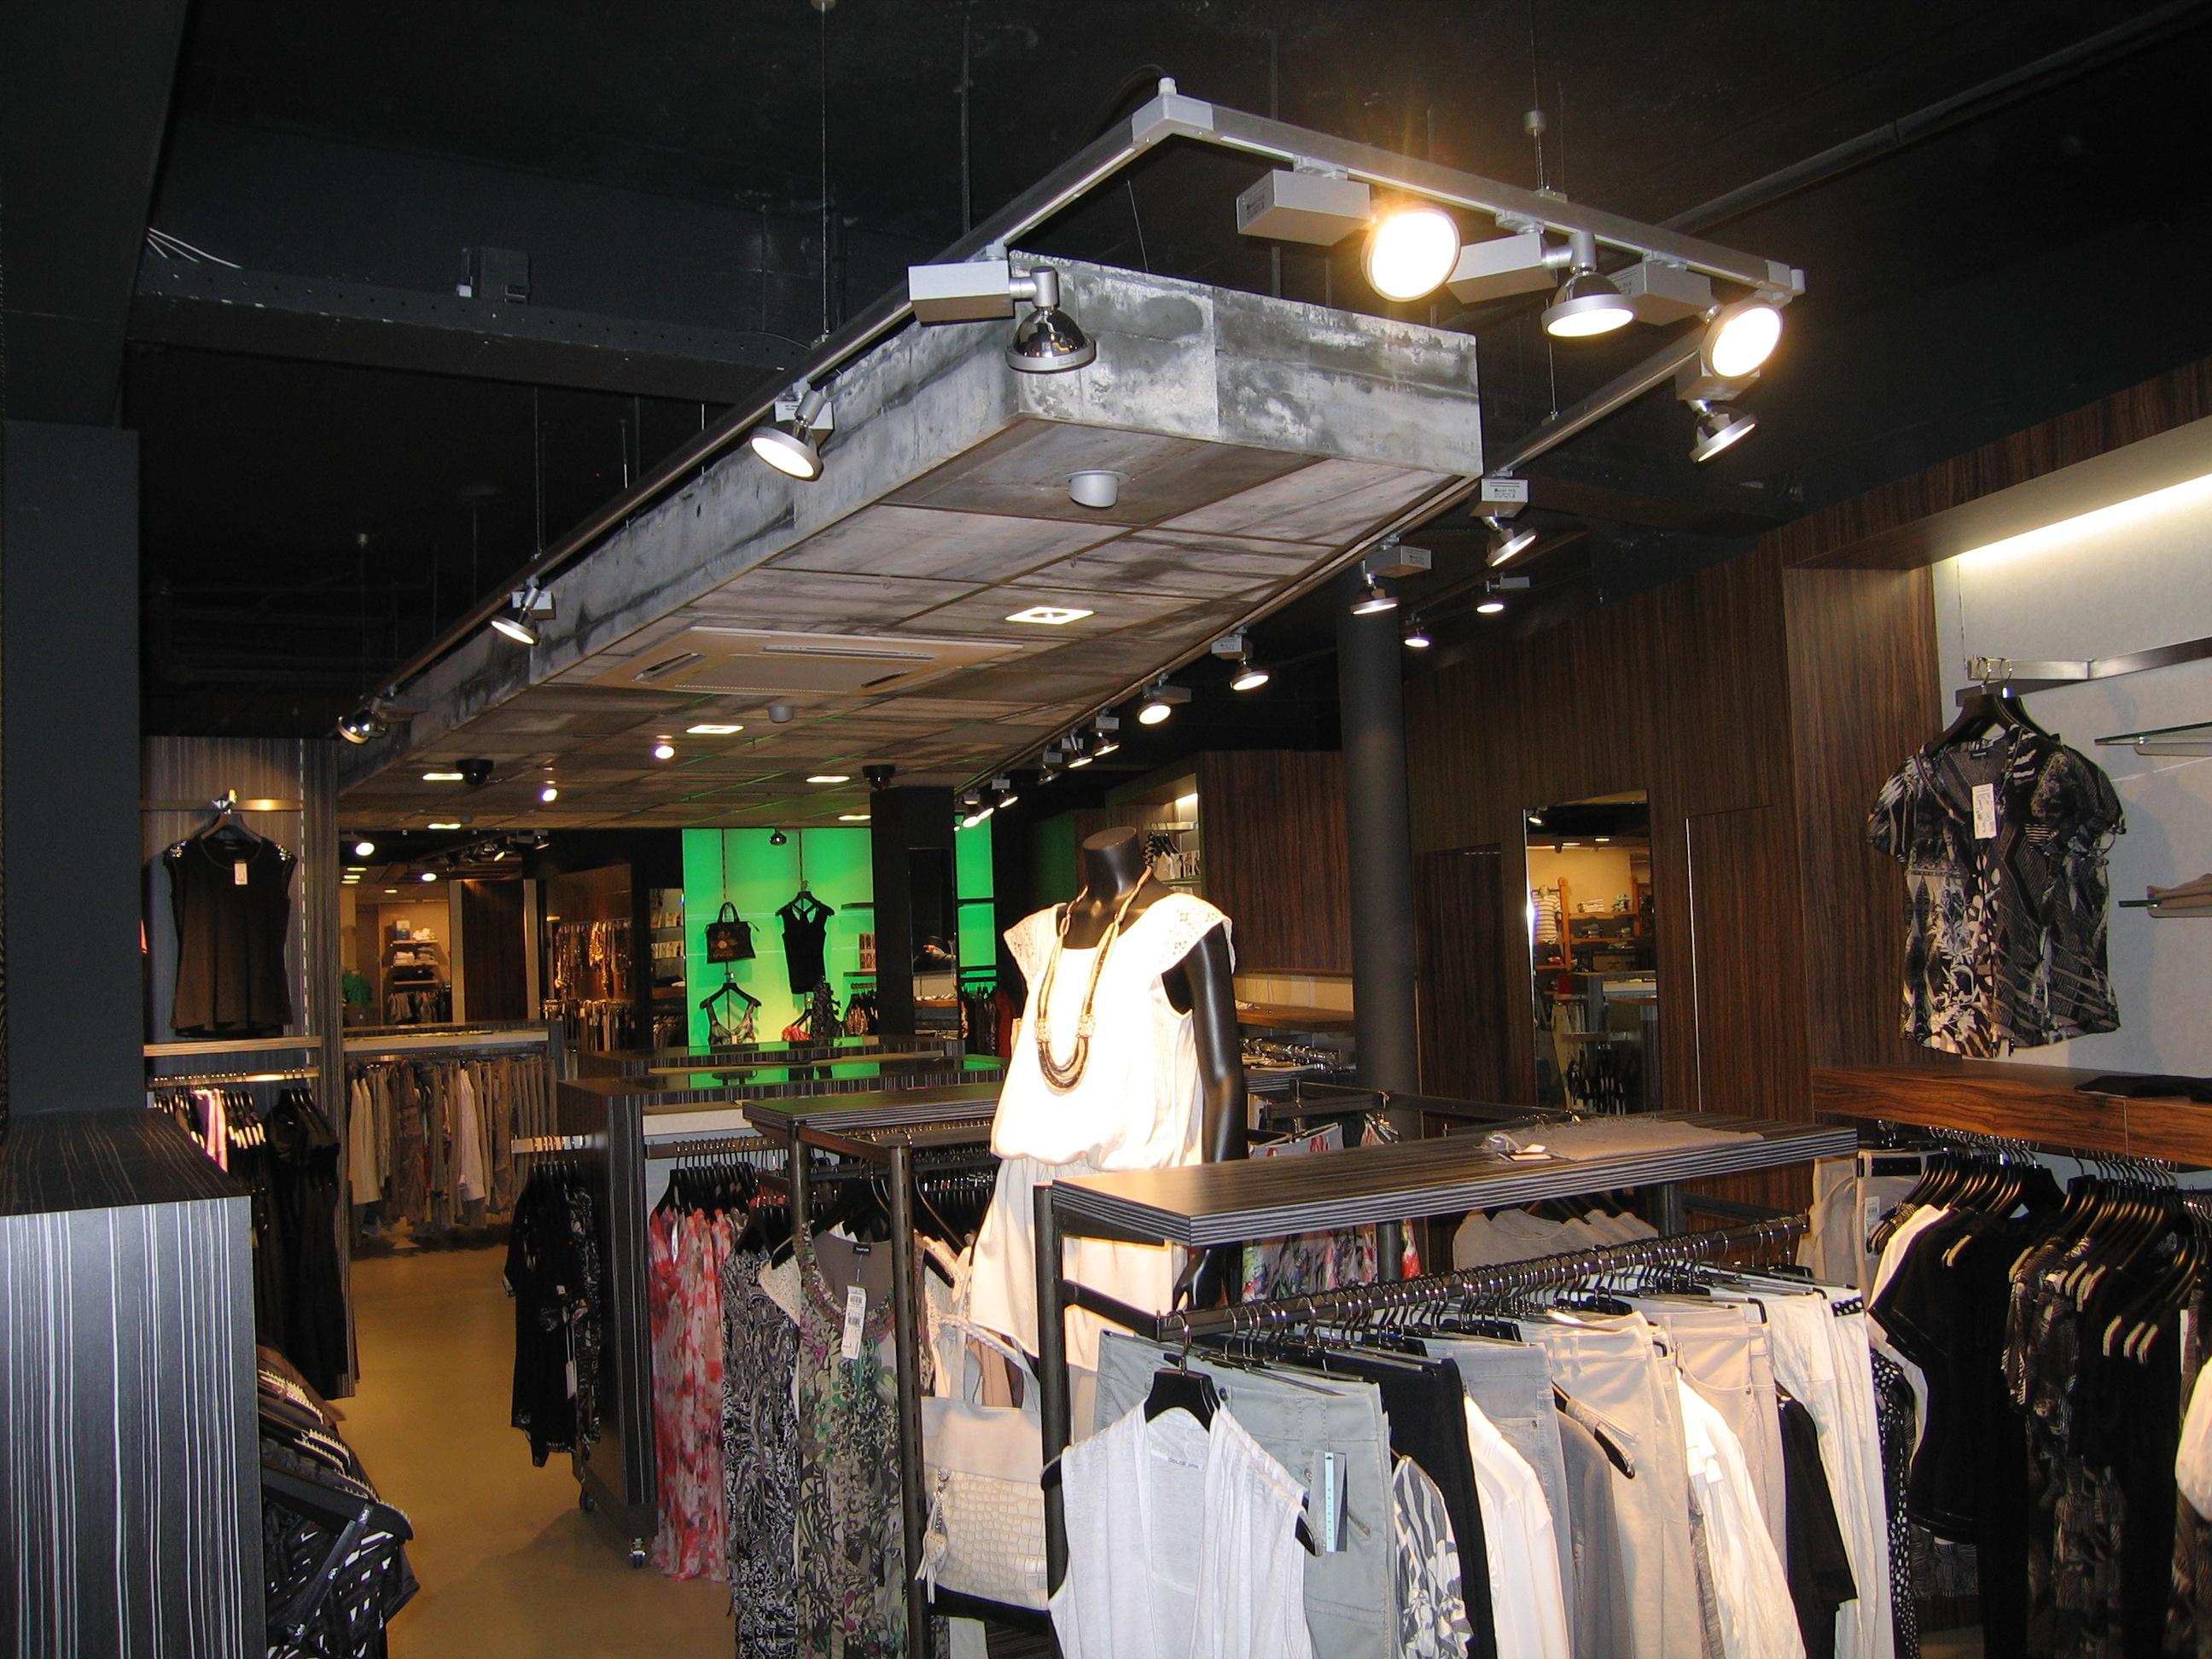 plfond-kleding-winkel